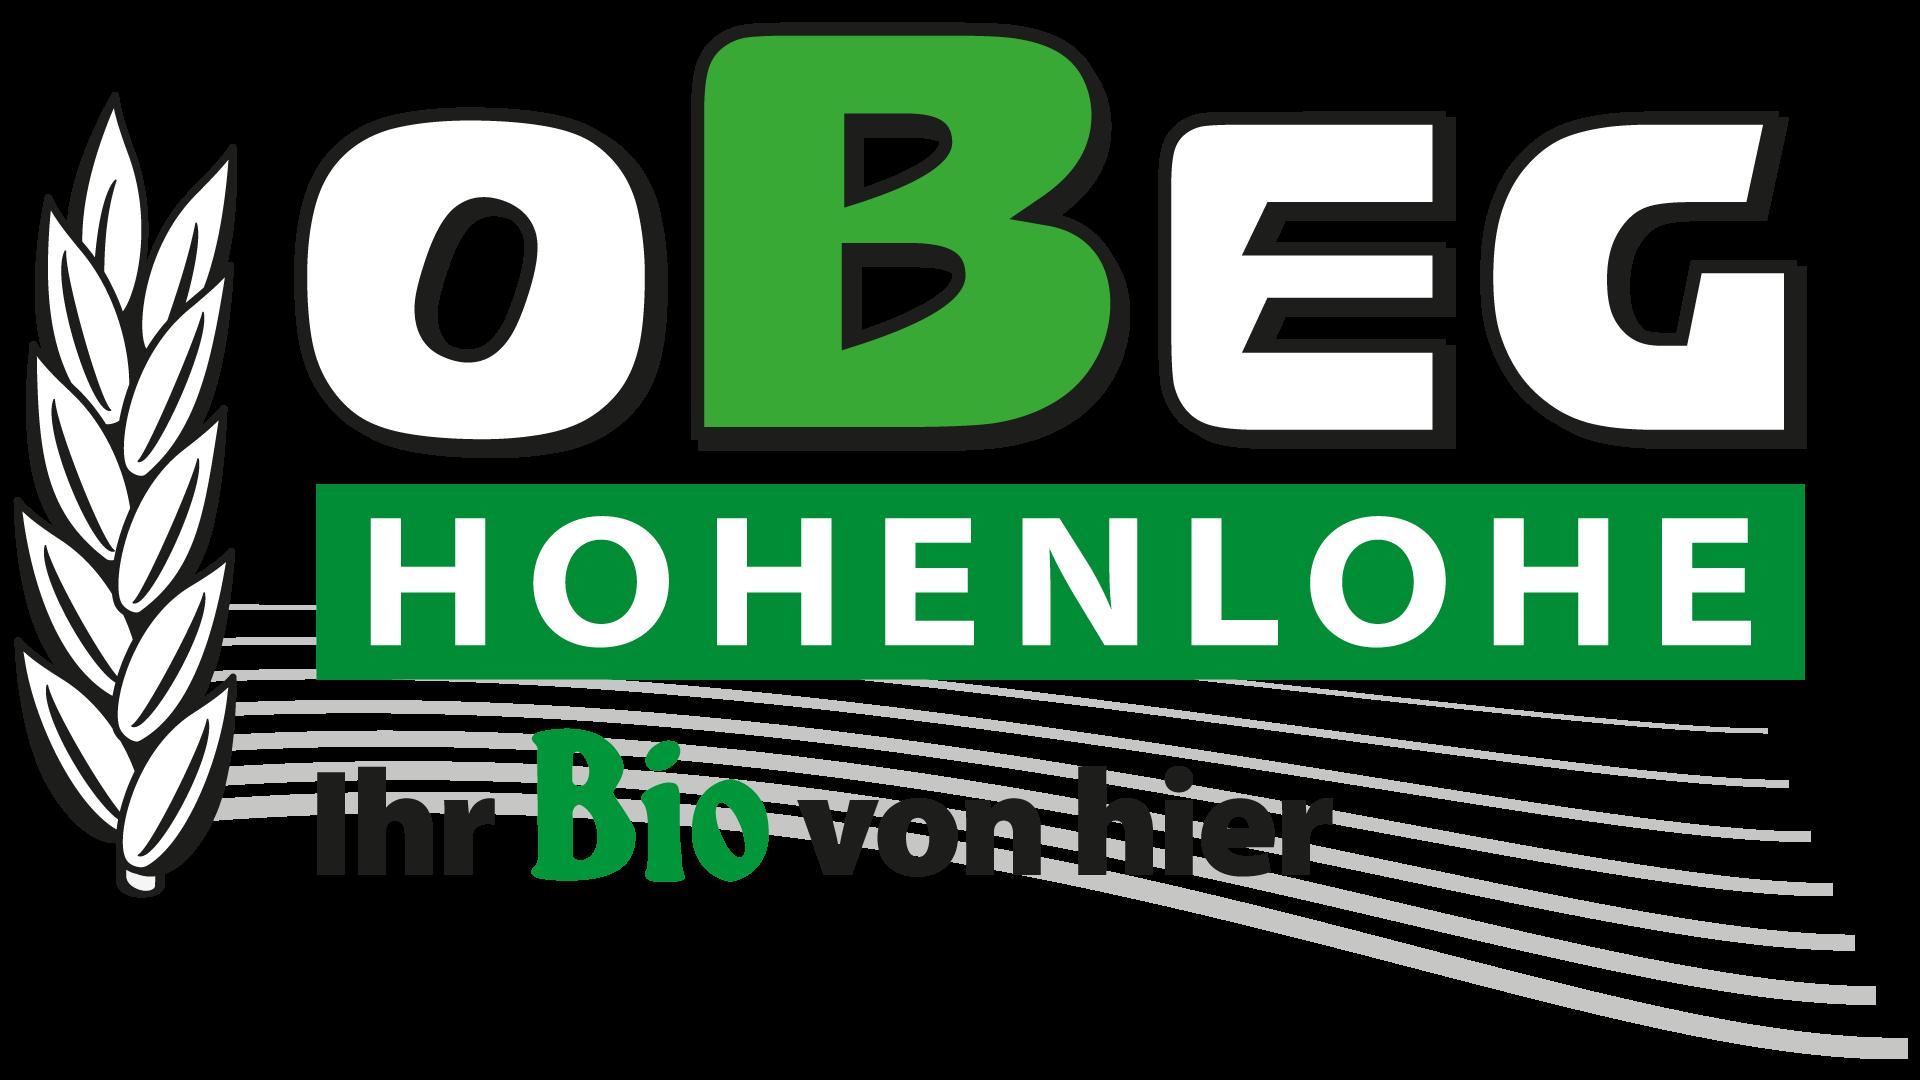 OBEG HOHENLOHE